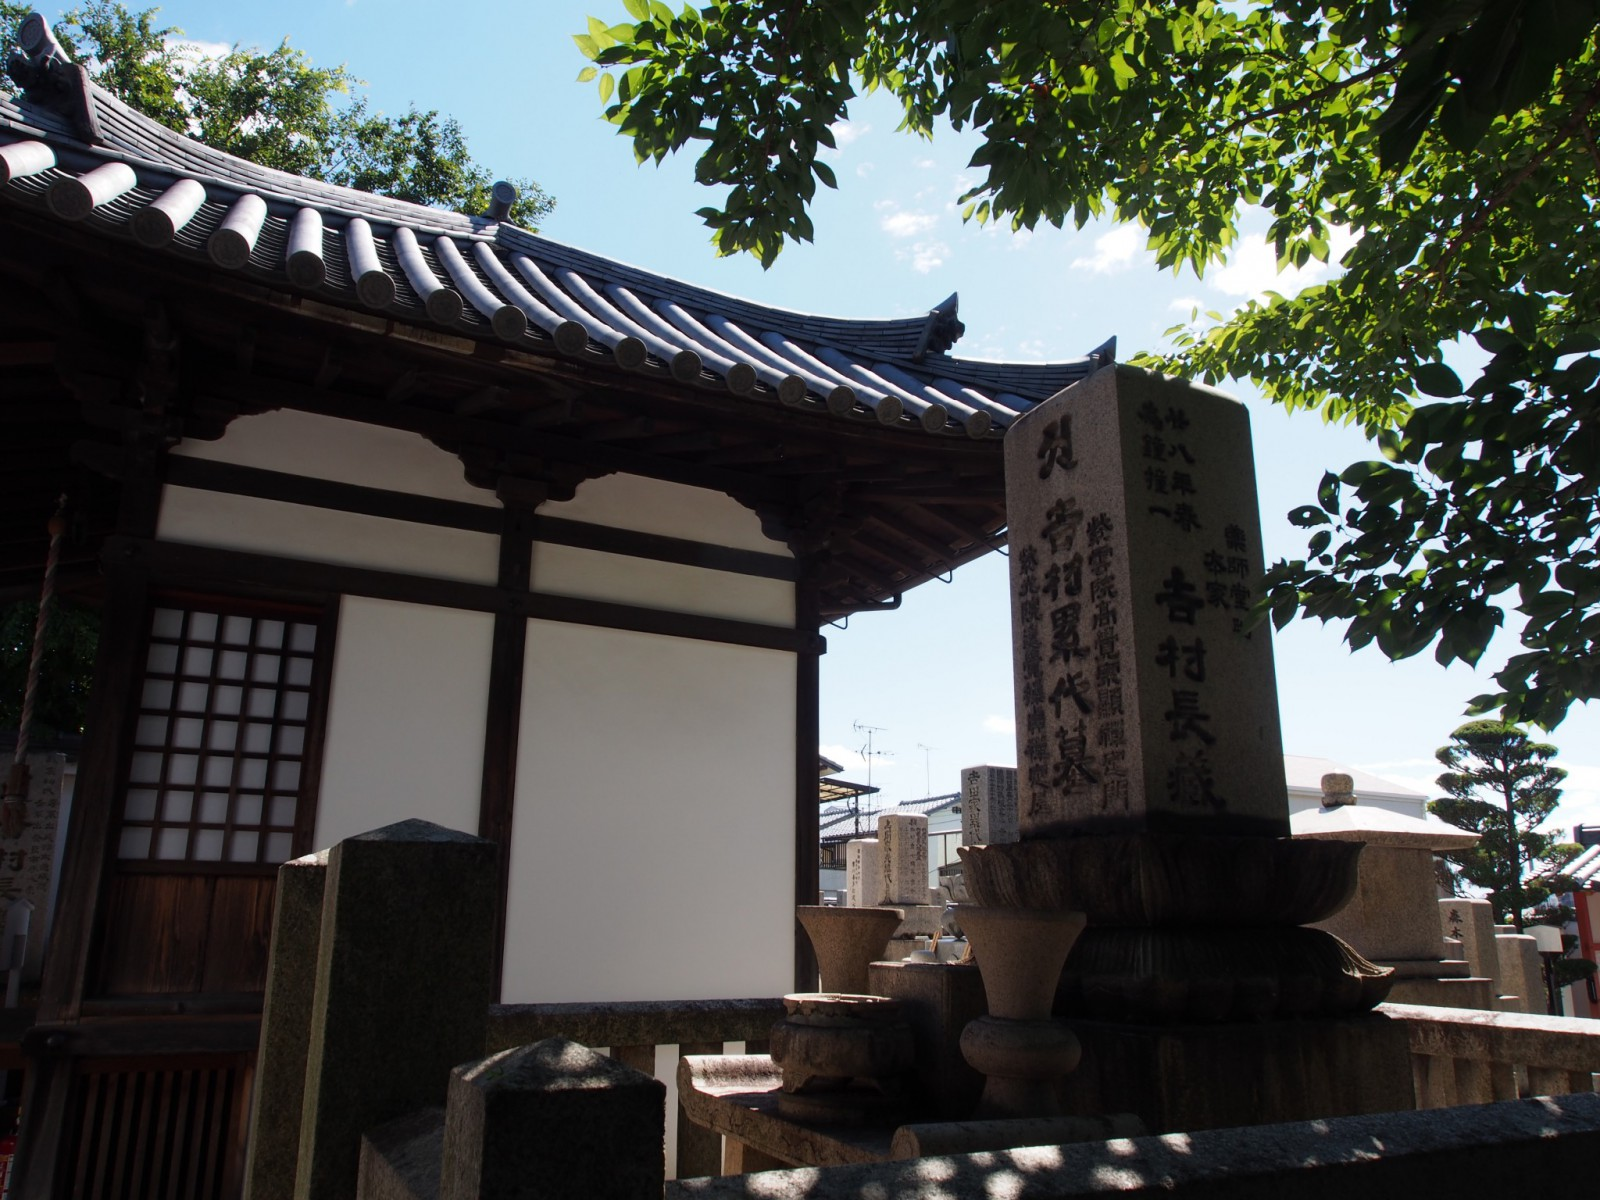 吉村家の墓と毘沙門堂(徳融寺)